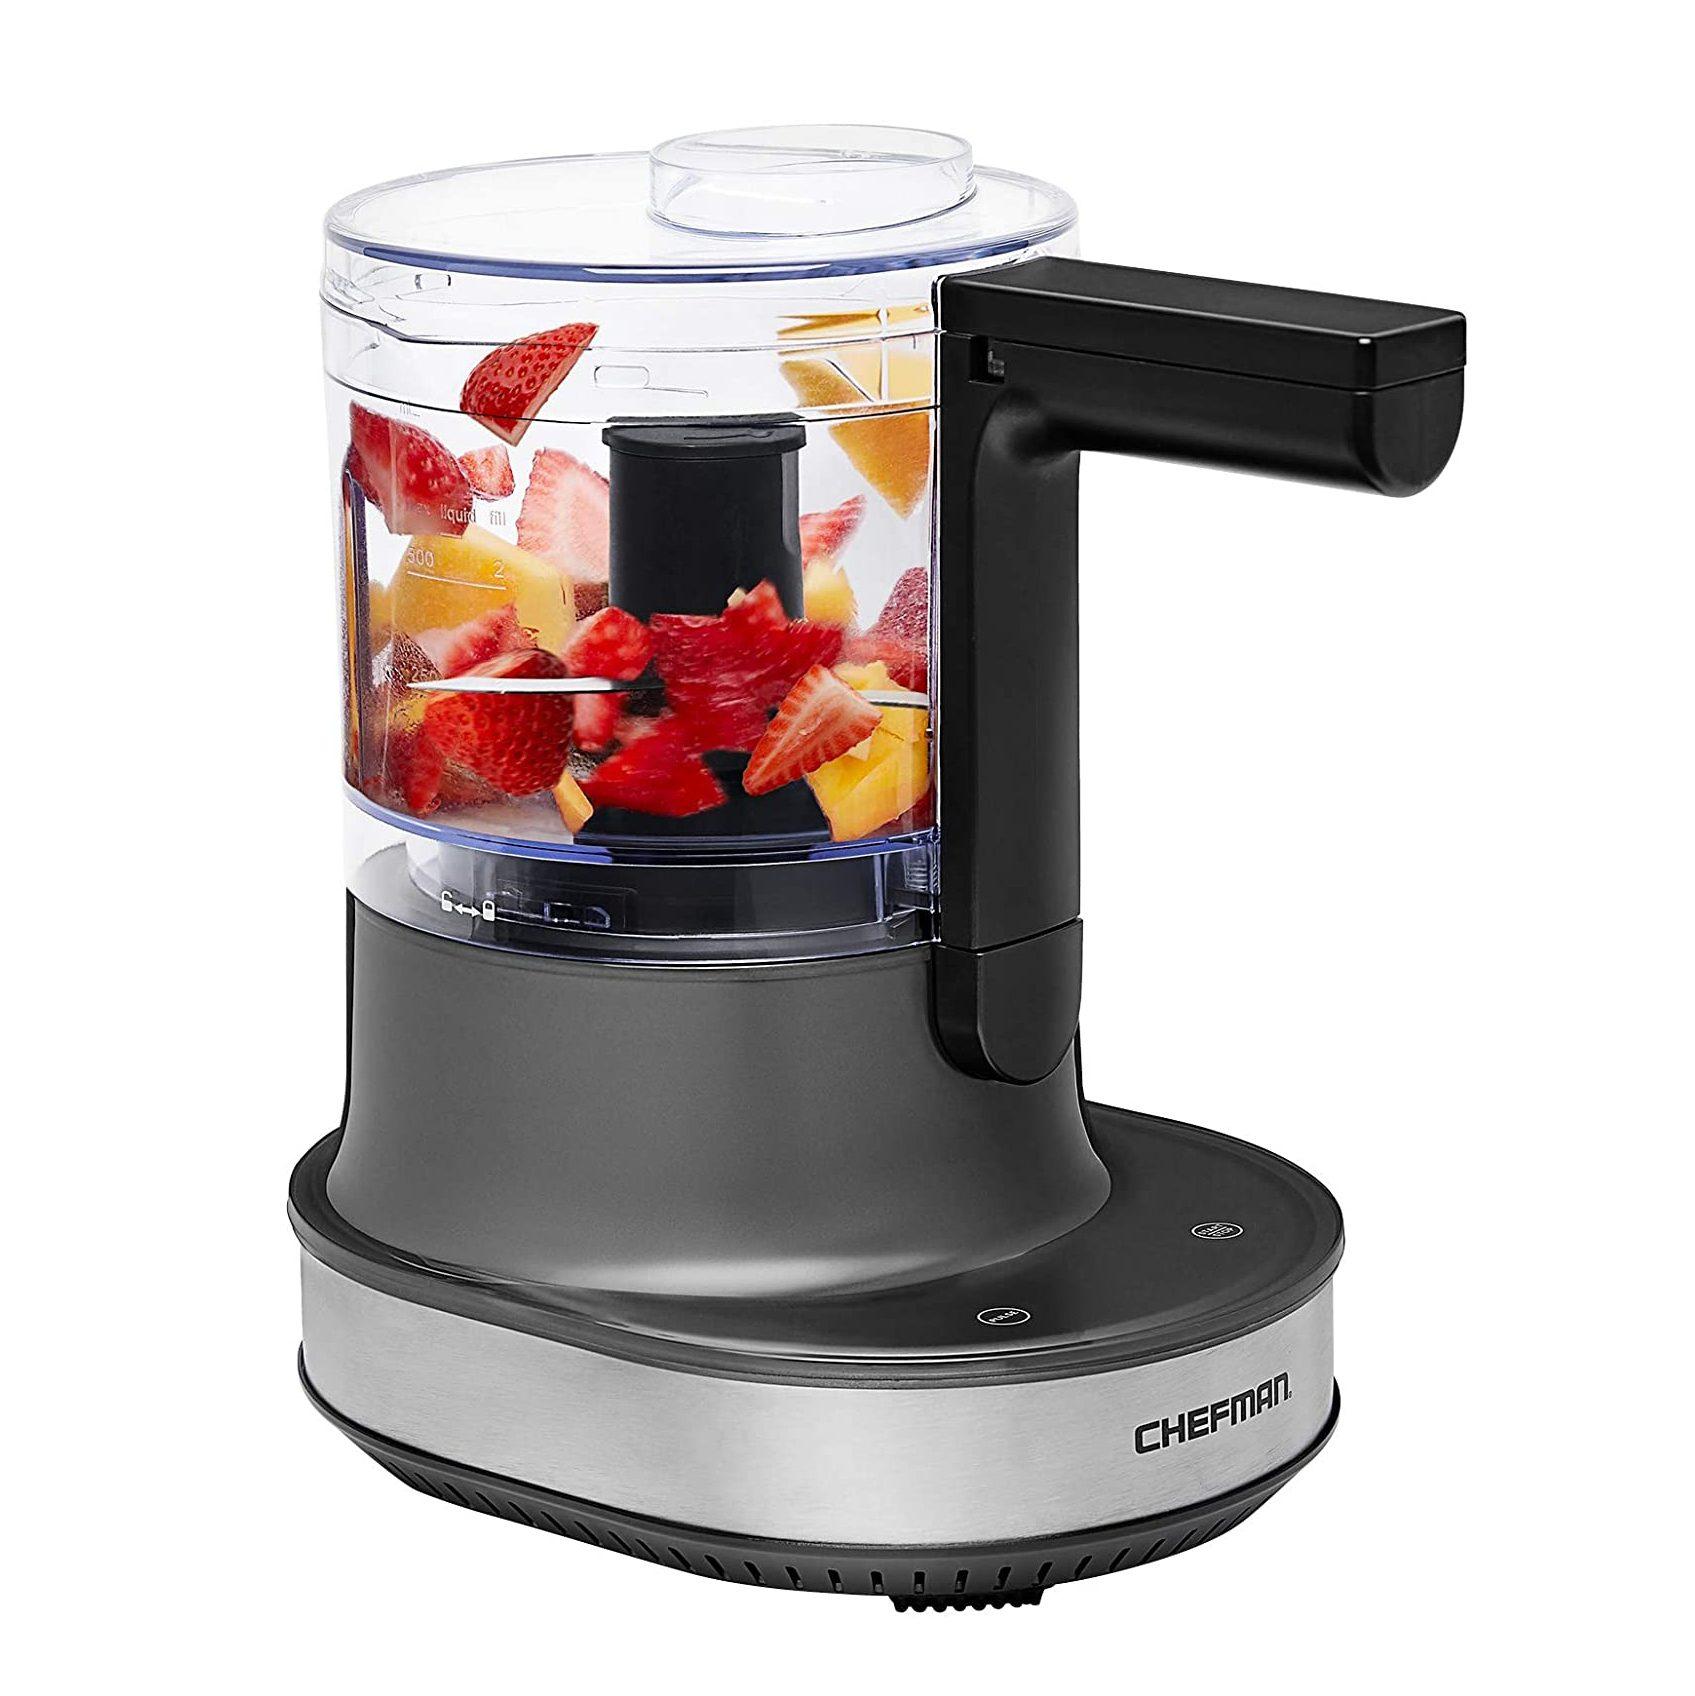 Chefman Electric Food Processor and Blender